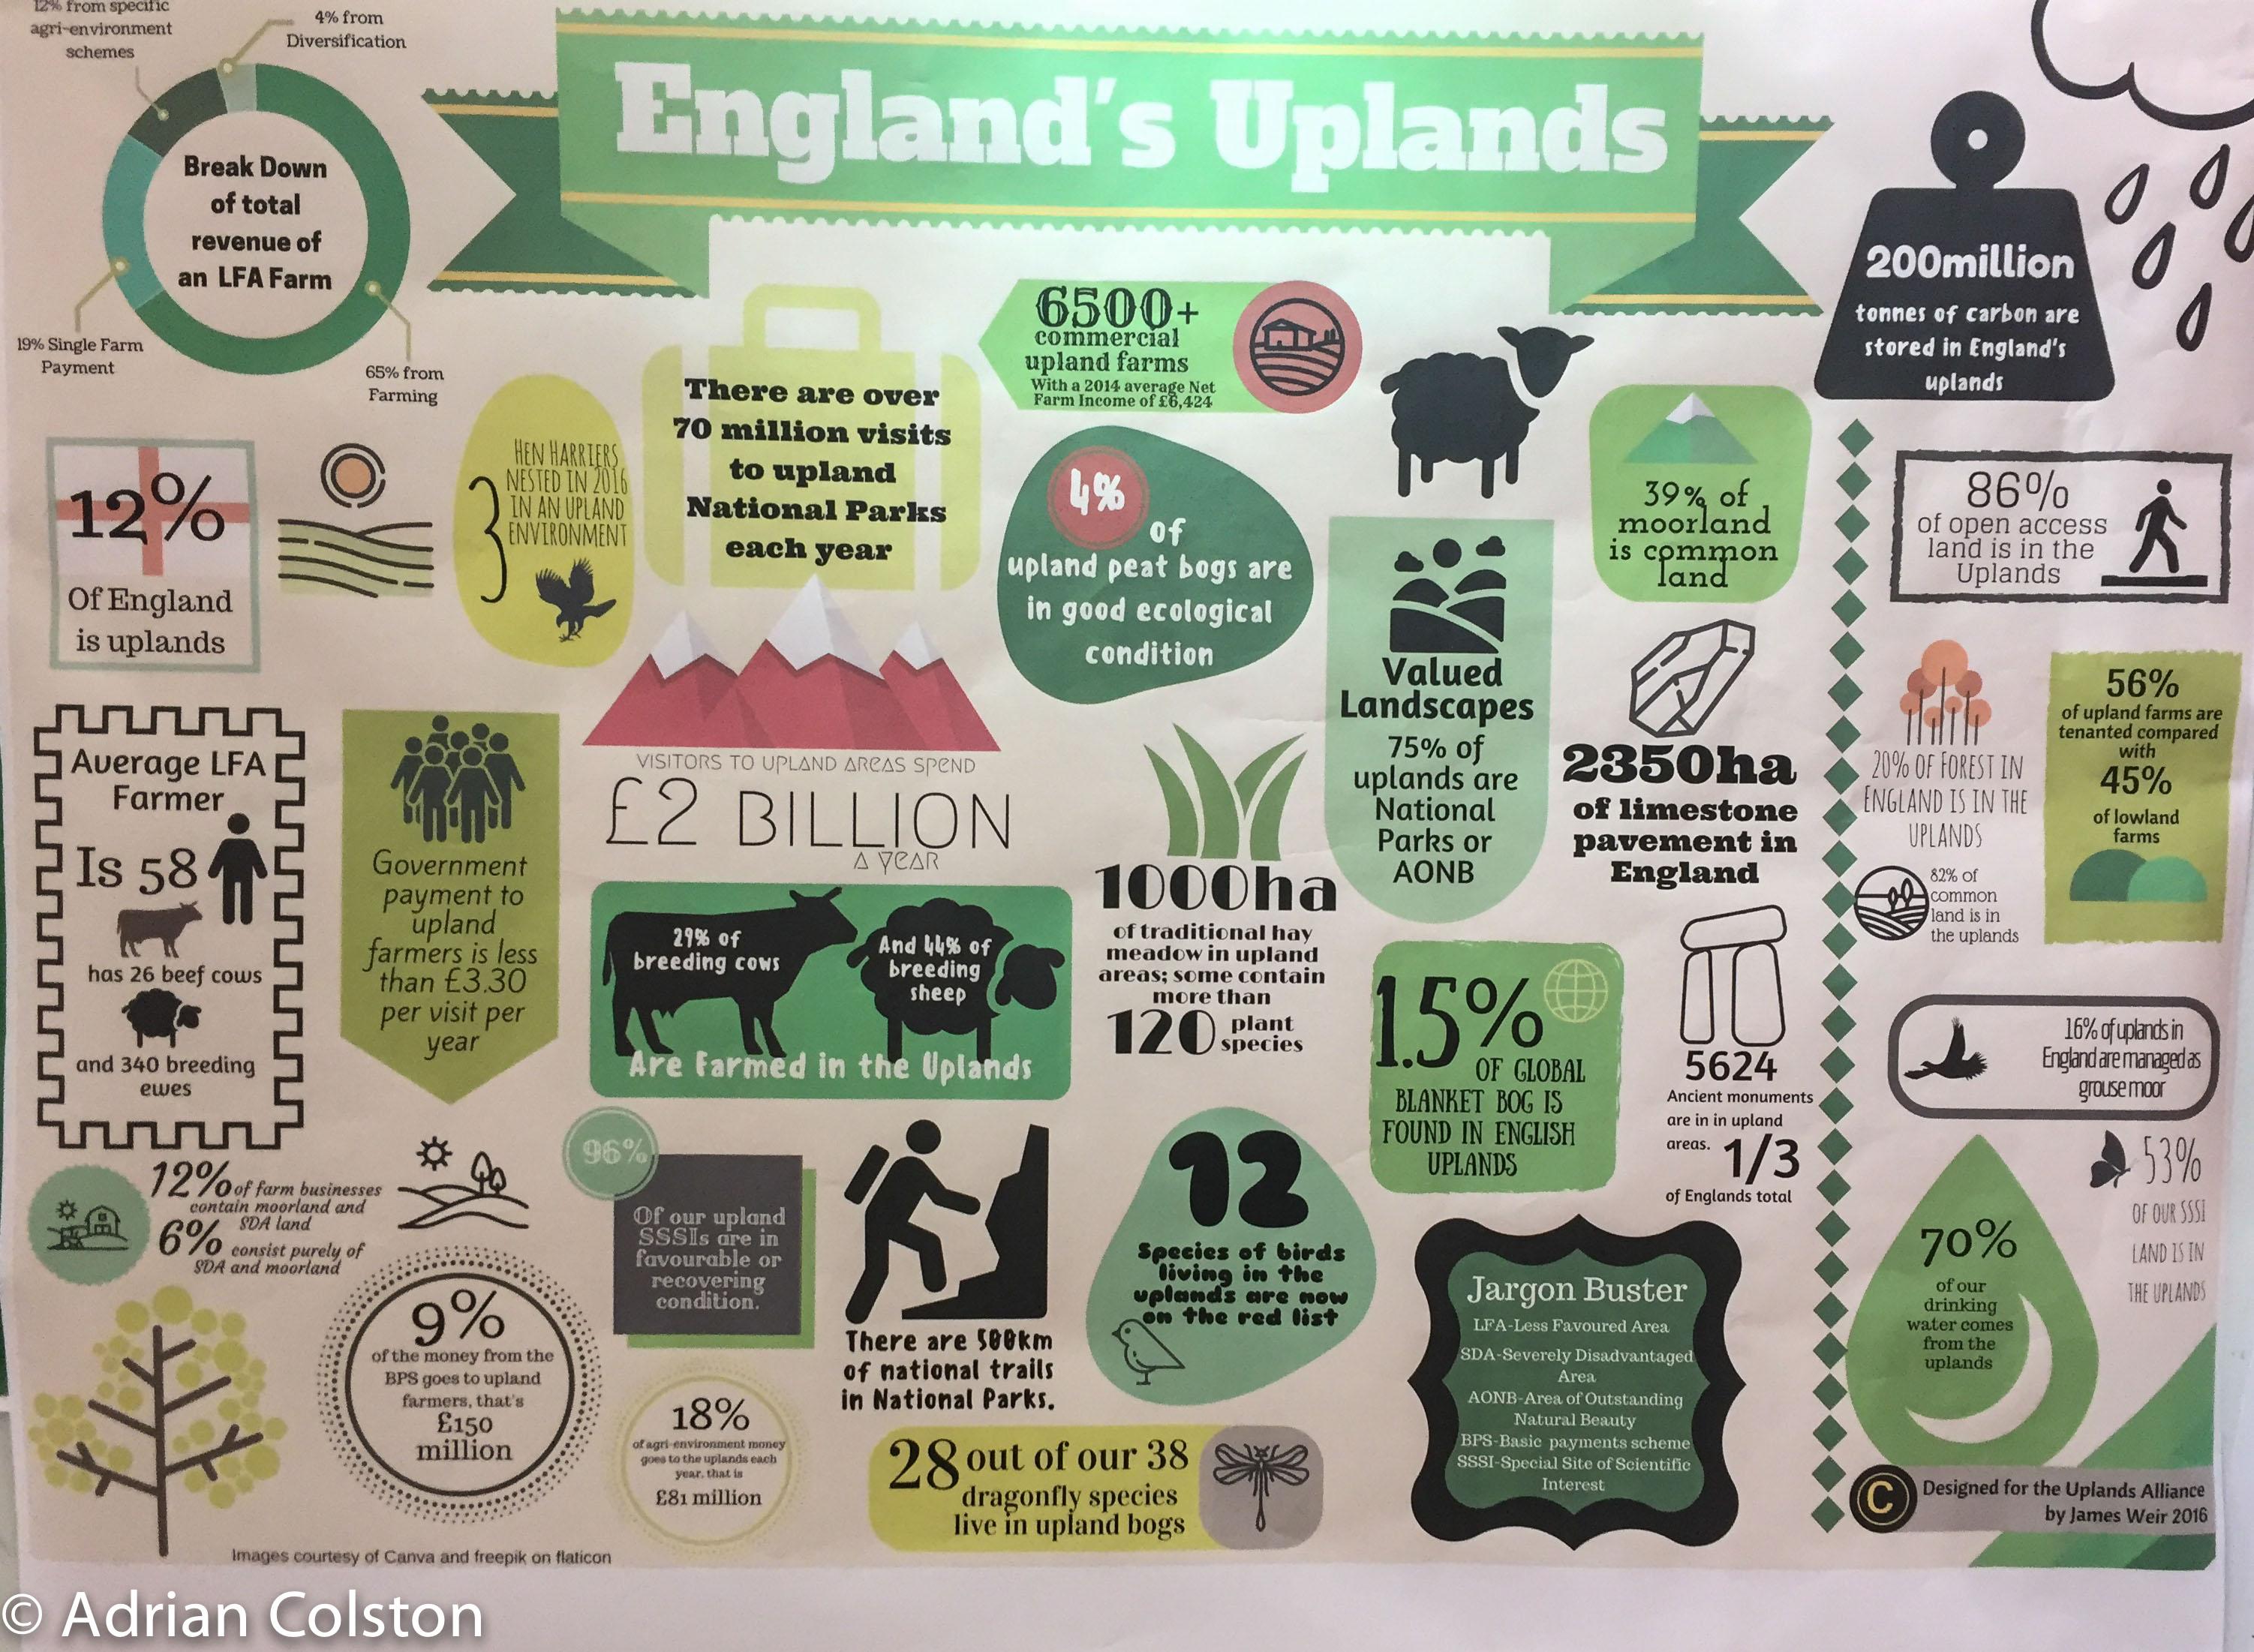 upland-alliance-poster